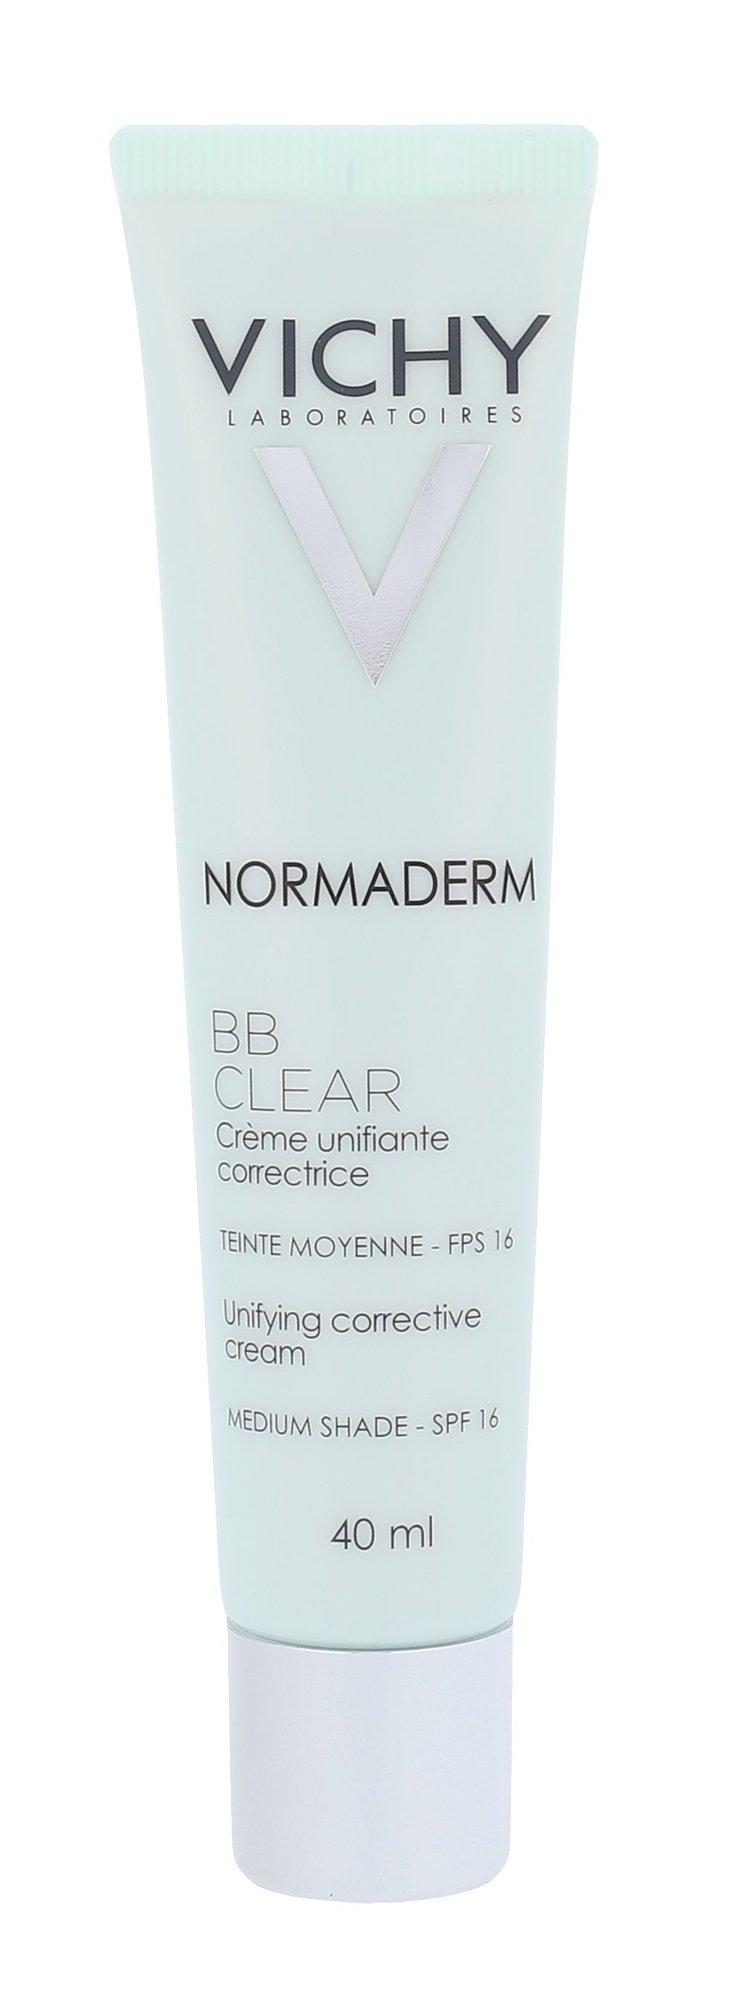 Vichy Normaderm Cosmetic 40ml Medium